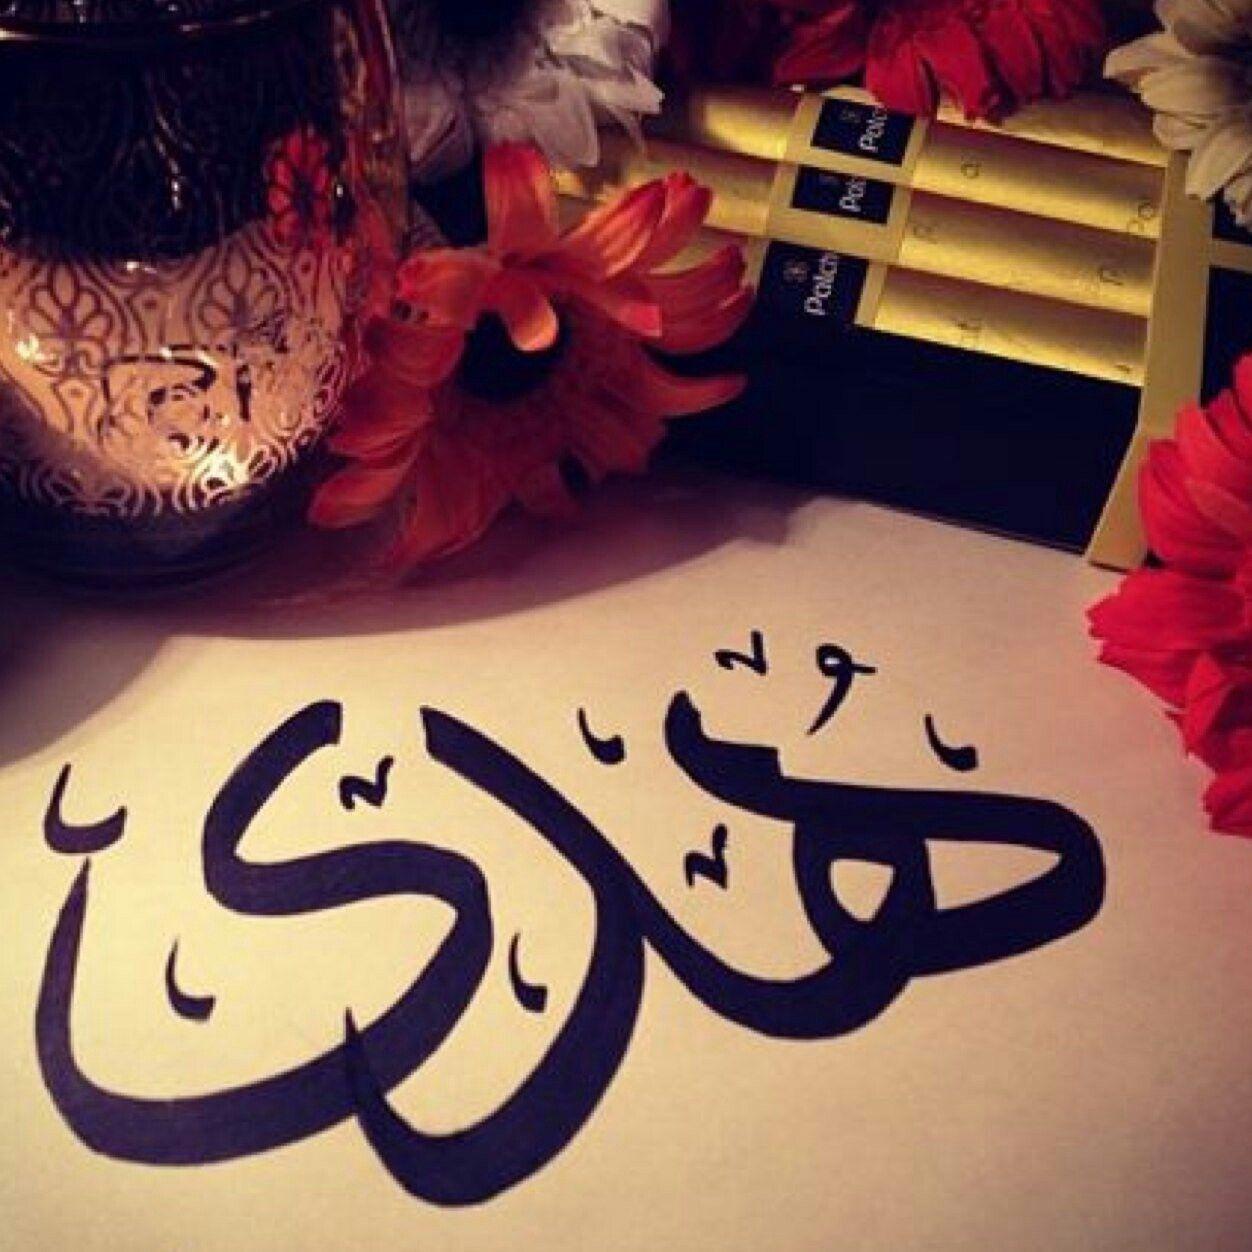 Pin By ويبقى الأمل مادامت الحياة On اسماء Names Flower Printable Calligraphy Artwork Arabic Art